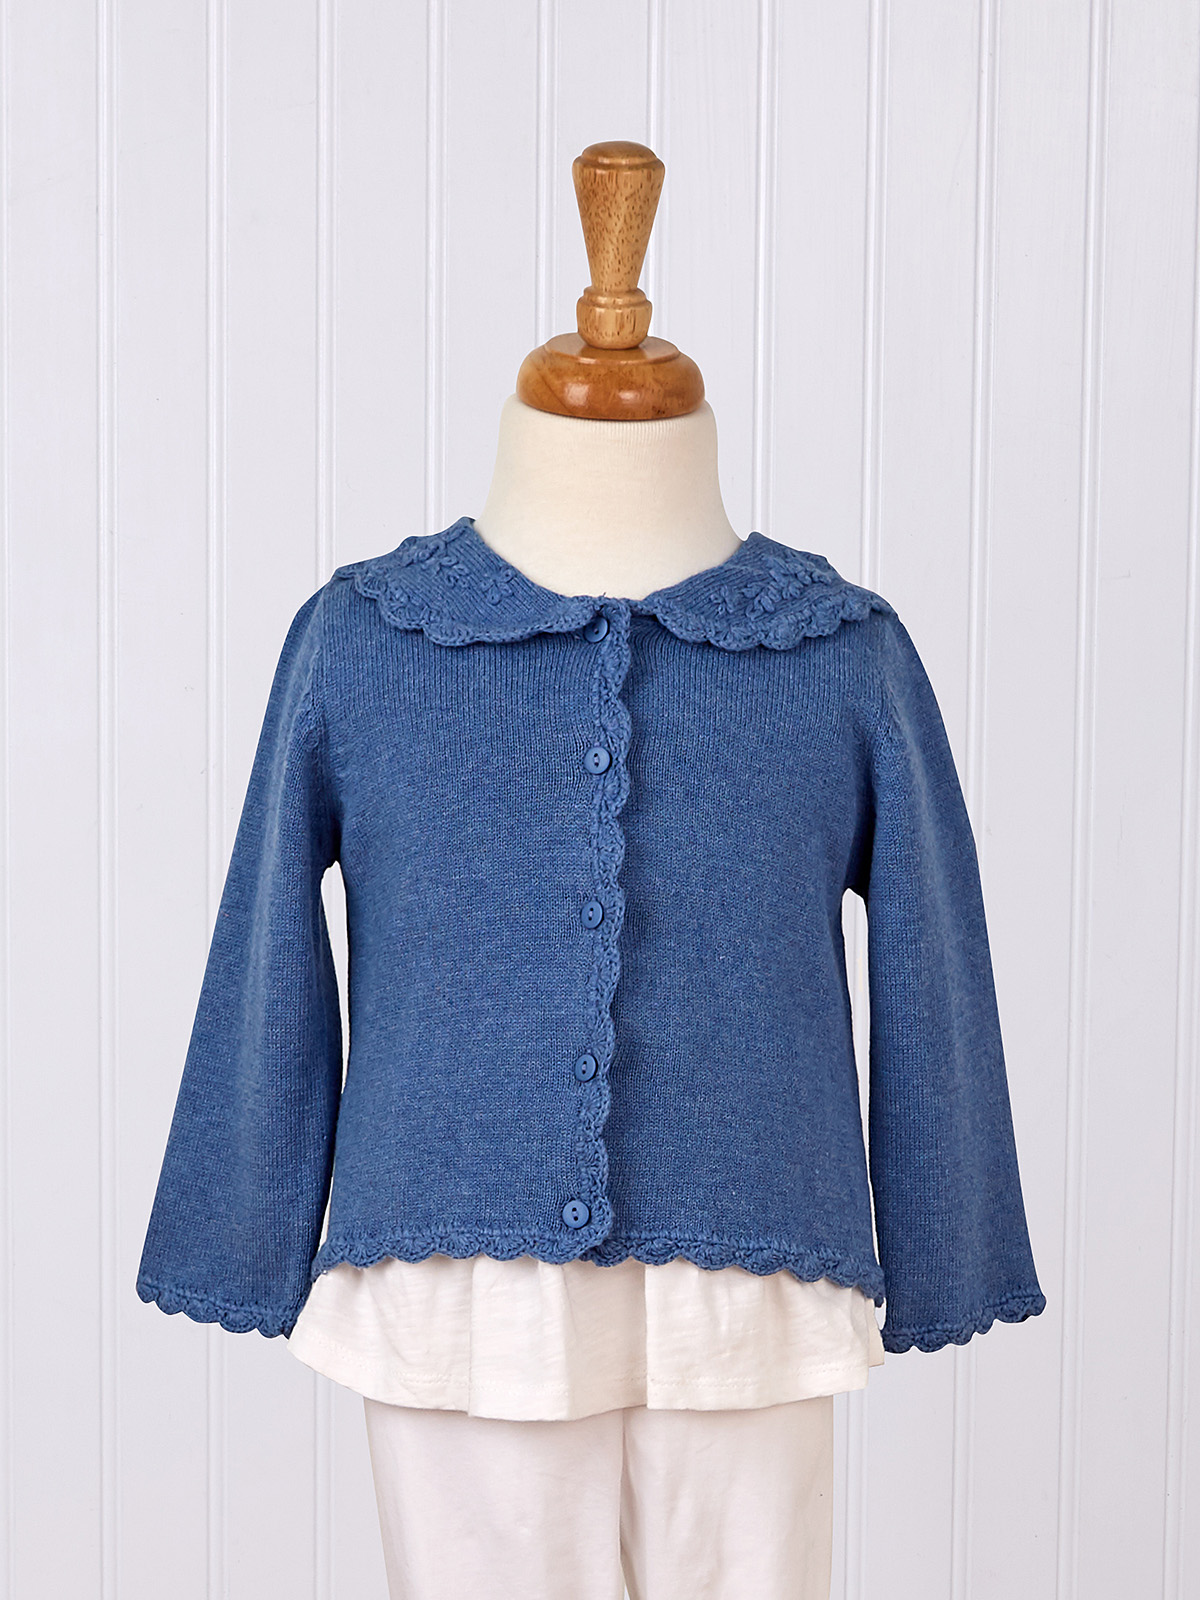 Bianca LG Sweater